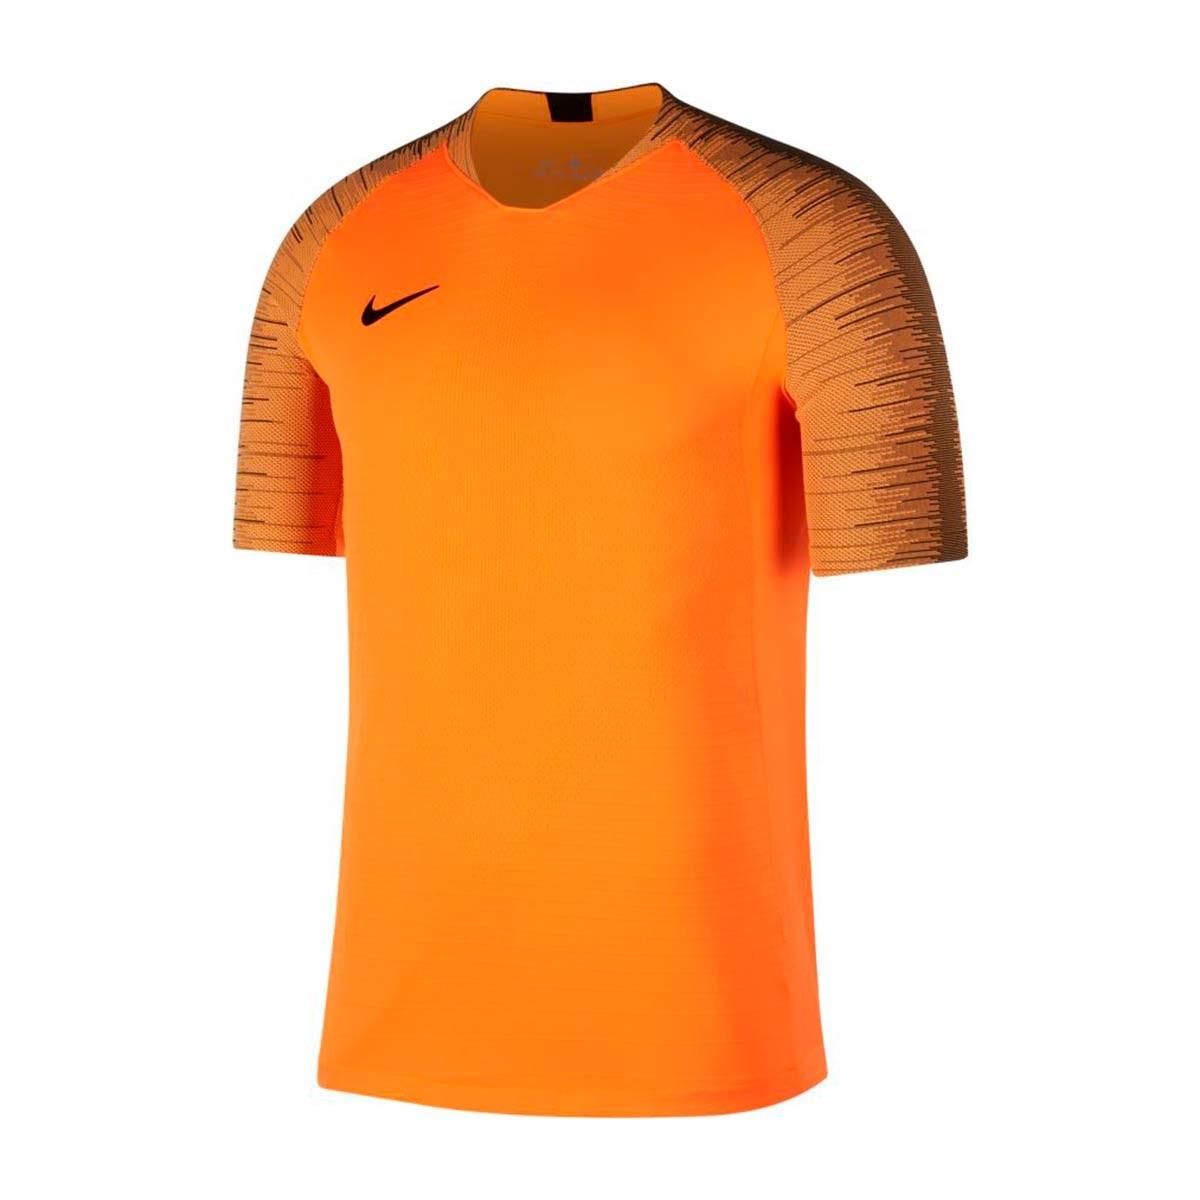 67d2e19dac0 Jersey Nike Aeroswift Strike Top SS Cone-Black - Football store ...